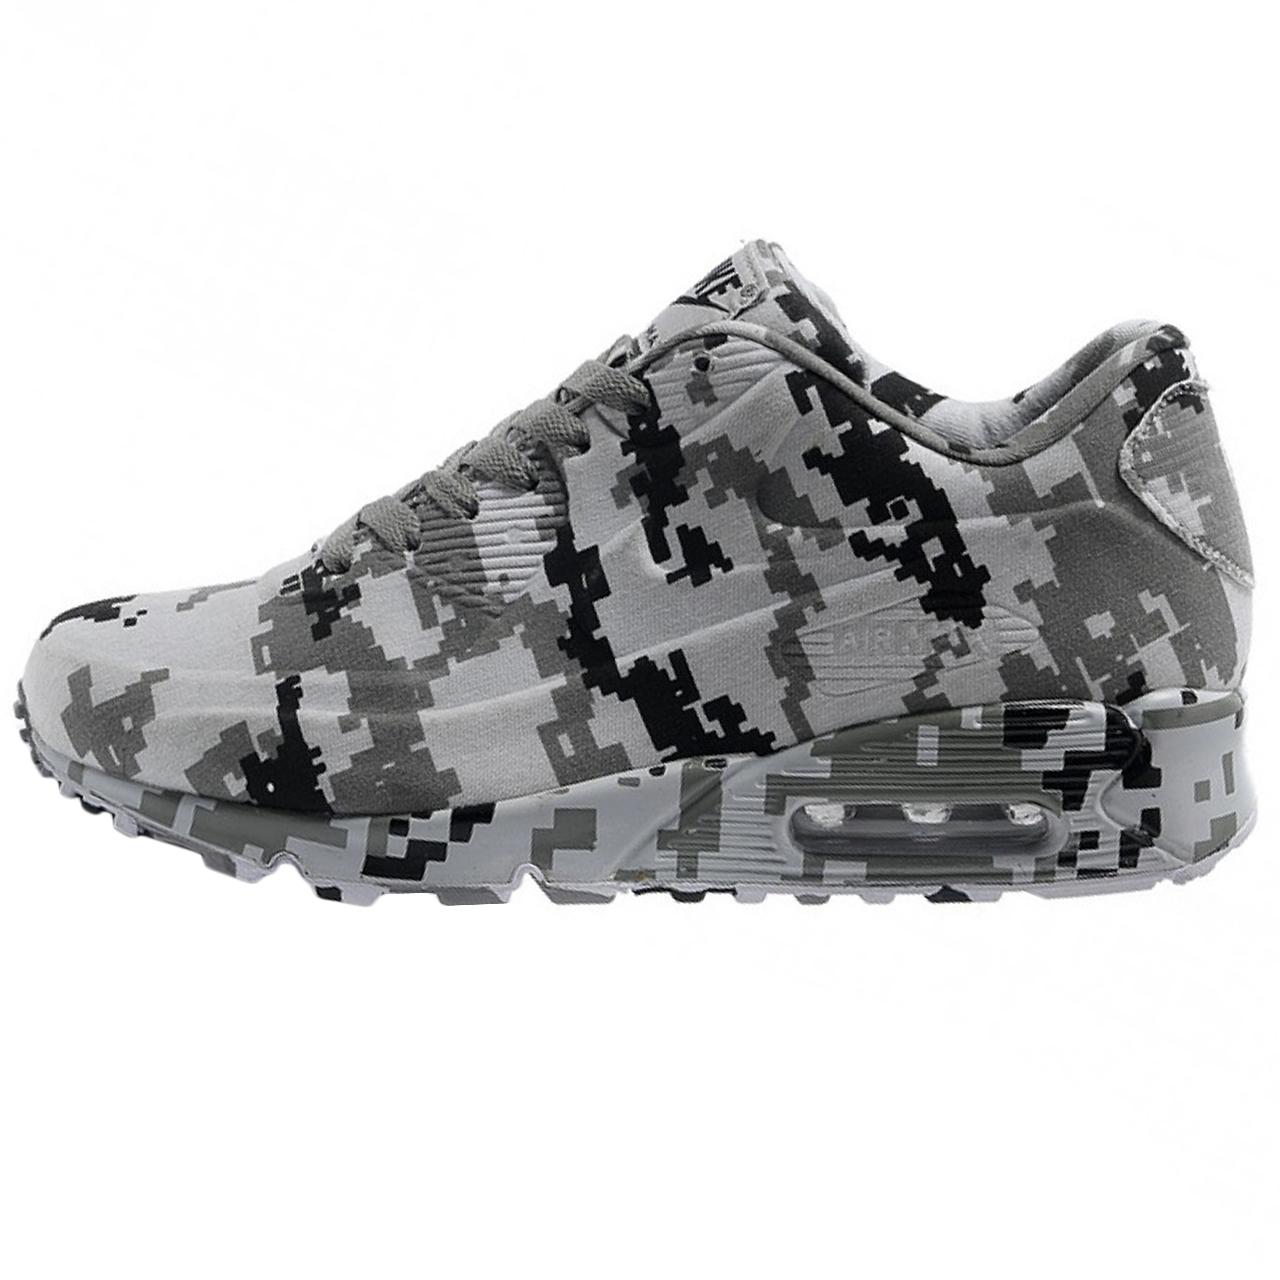 کفش مخصوص دویدن  زنانه نایکی مدل Air max کد 5678976